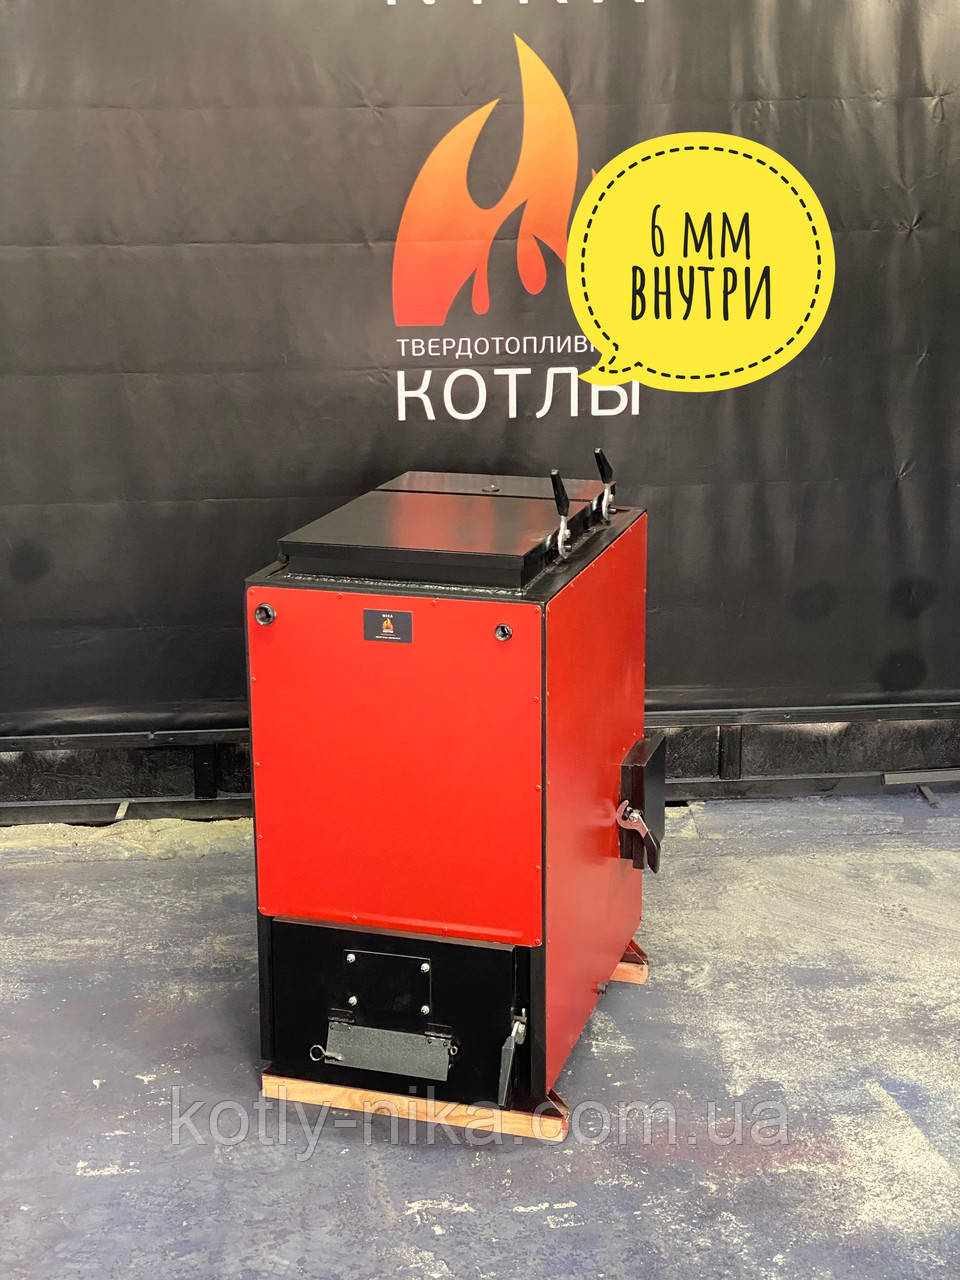 Котел шахтний 10 кВт (метал 6мм)